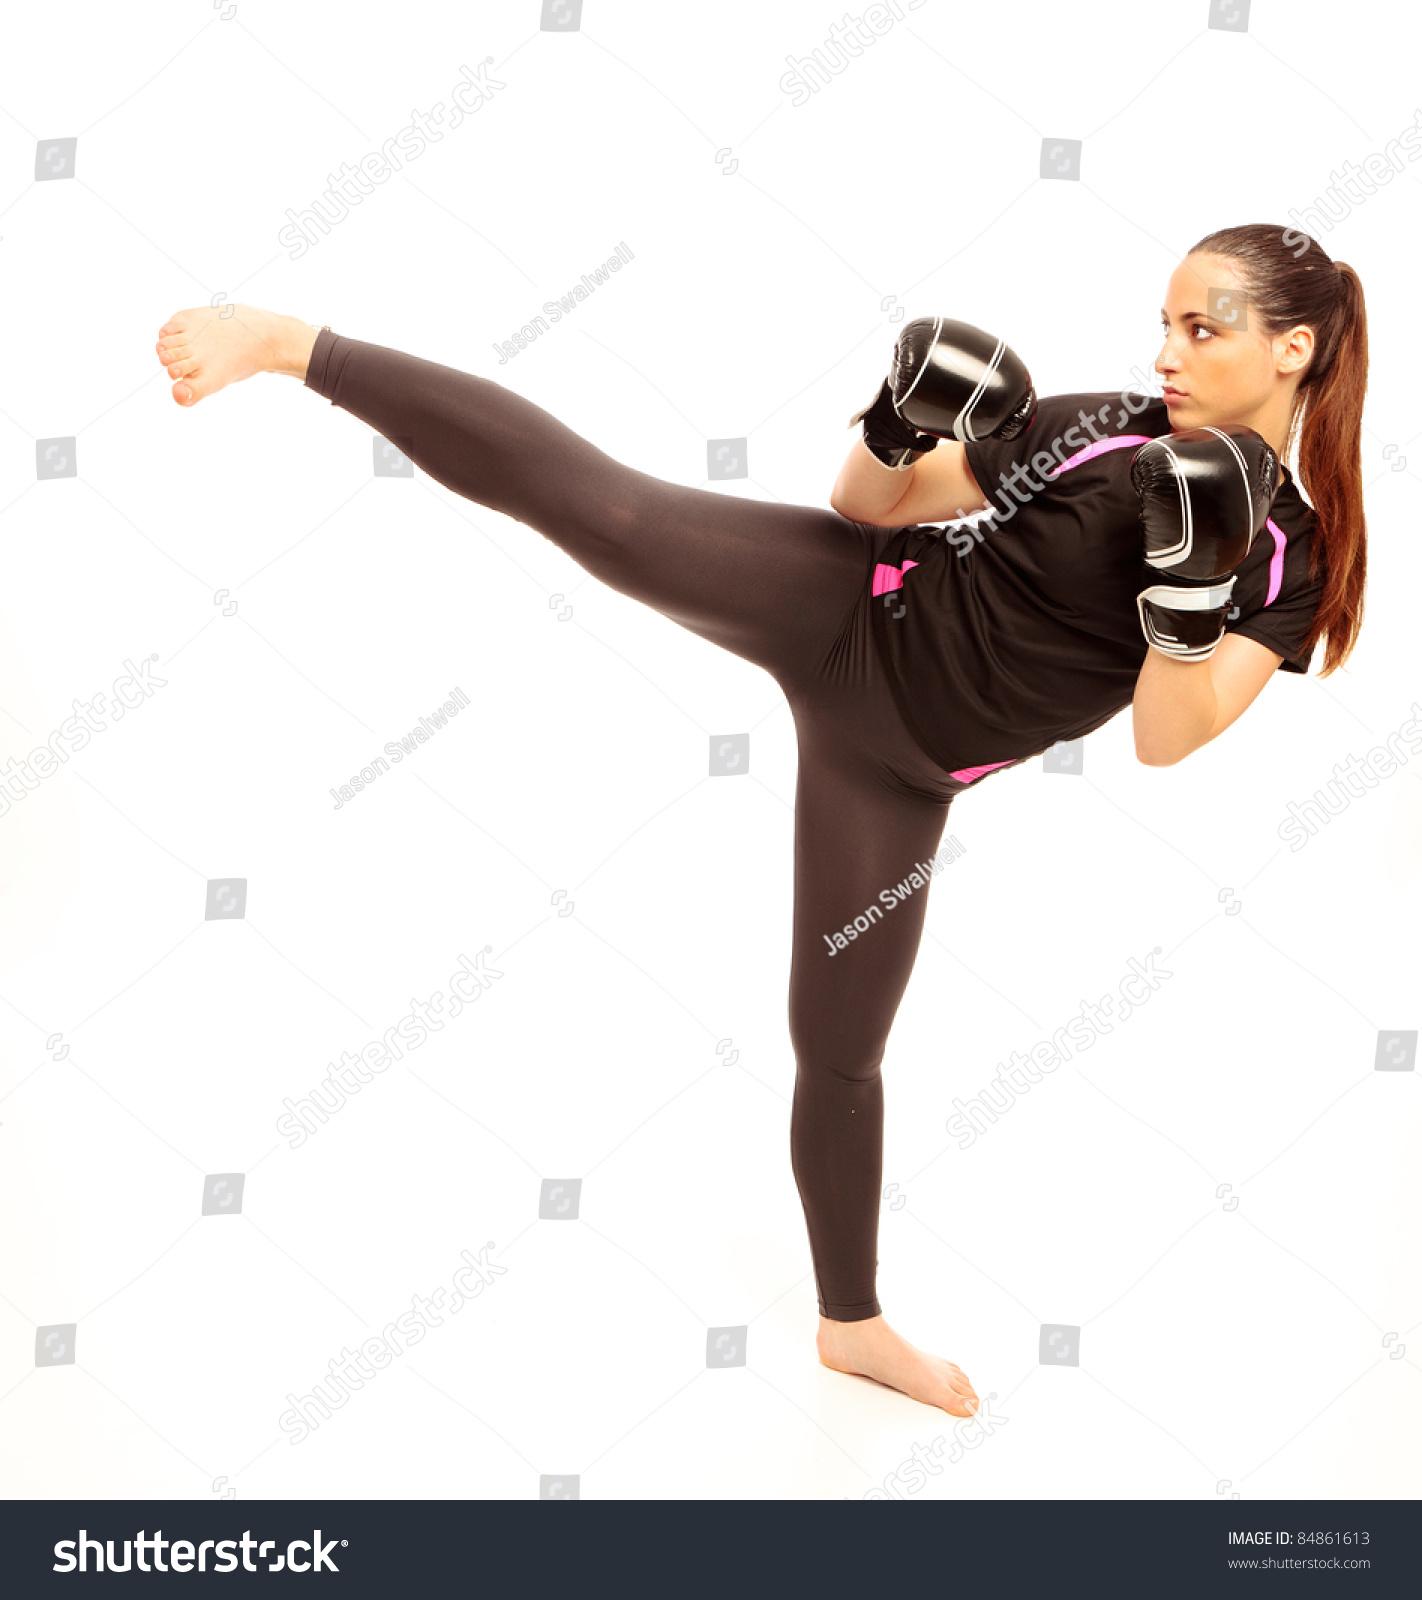 naked martial art photography women